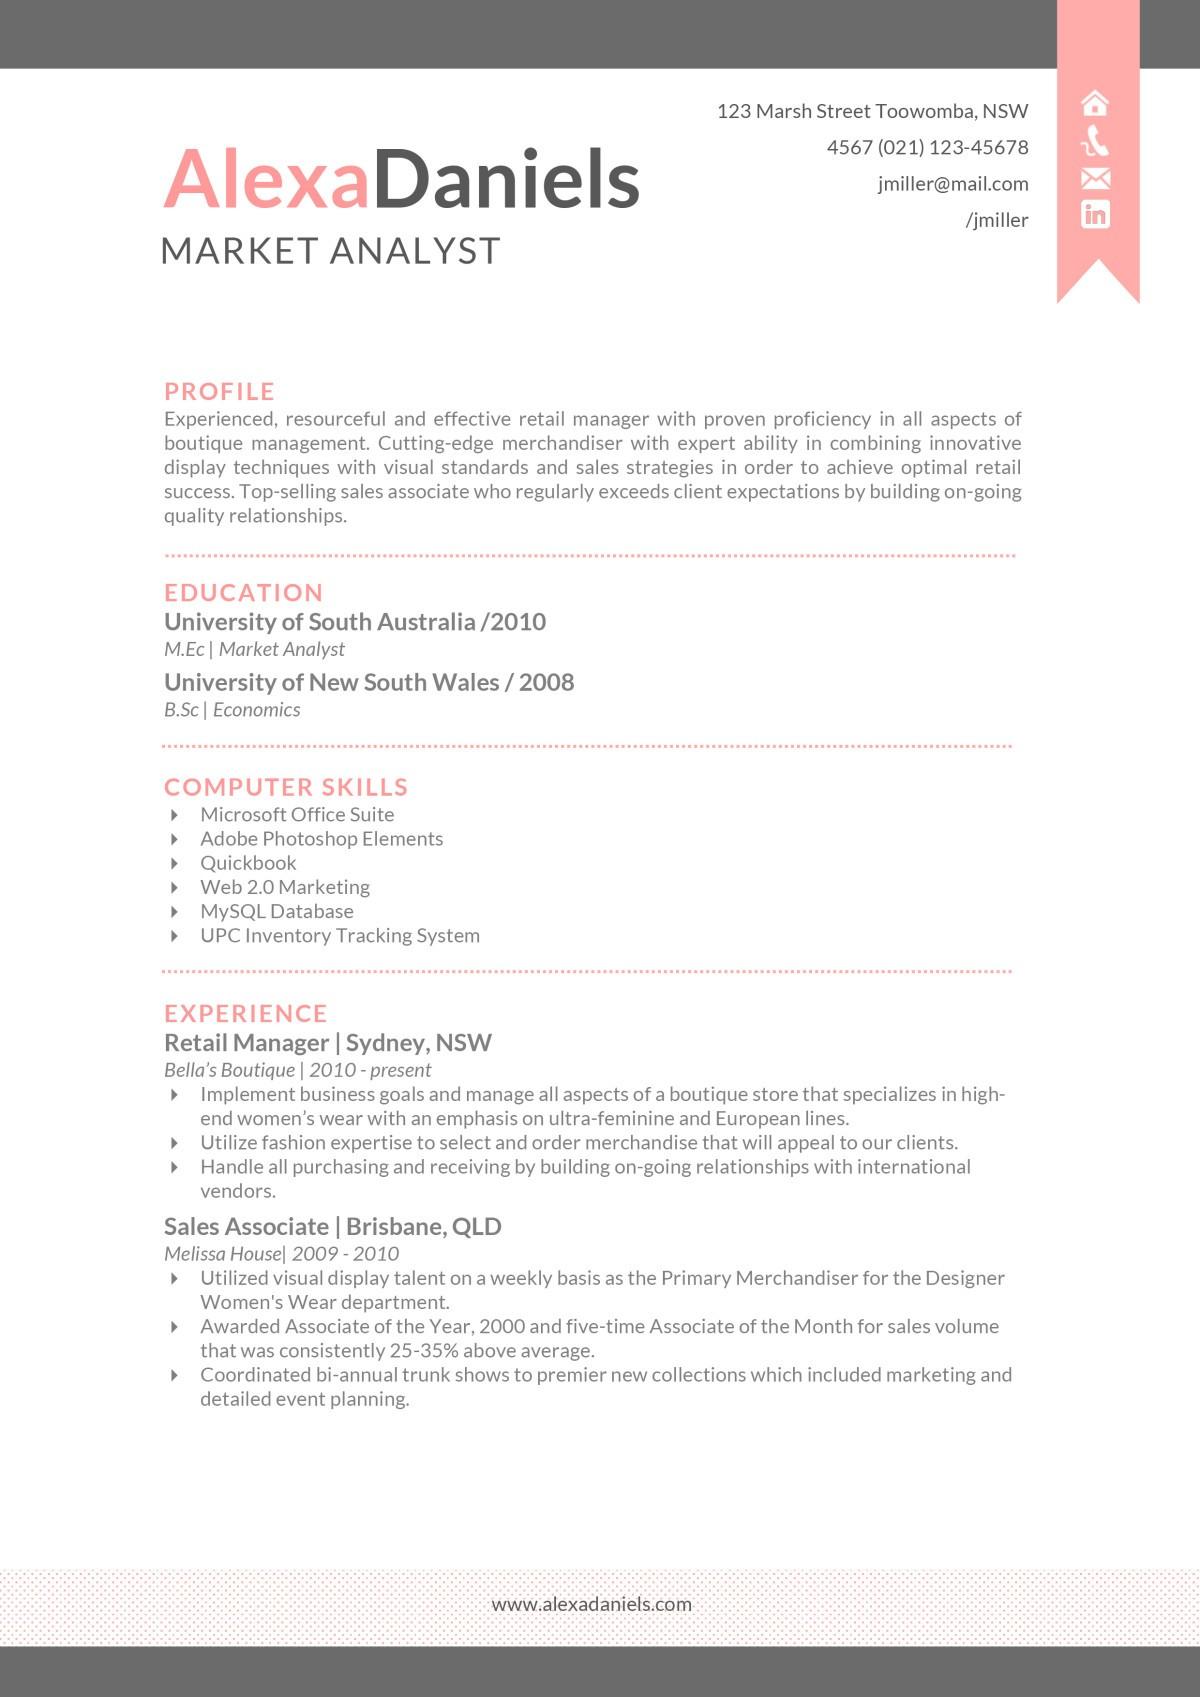 resume template skills  The Alexa Resume - Creative Resume Template - resume template skills